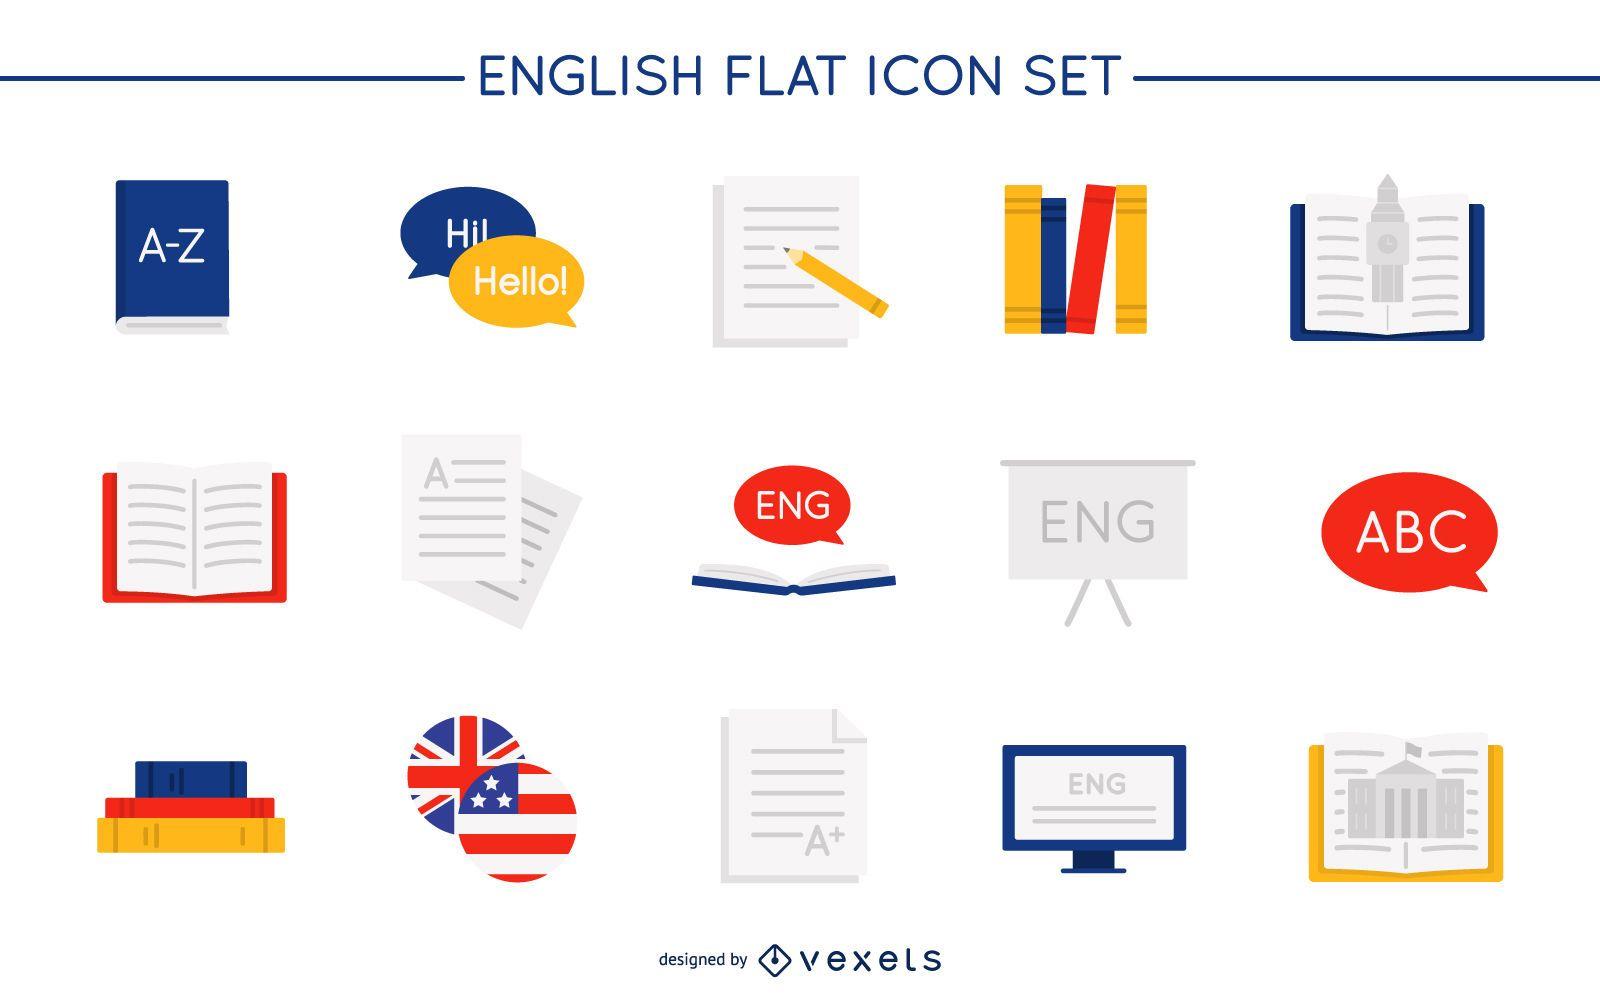 English flat icon set